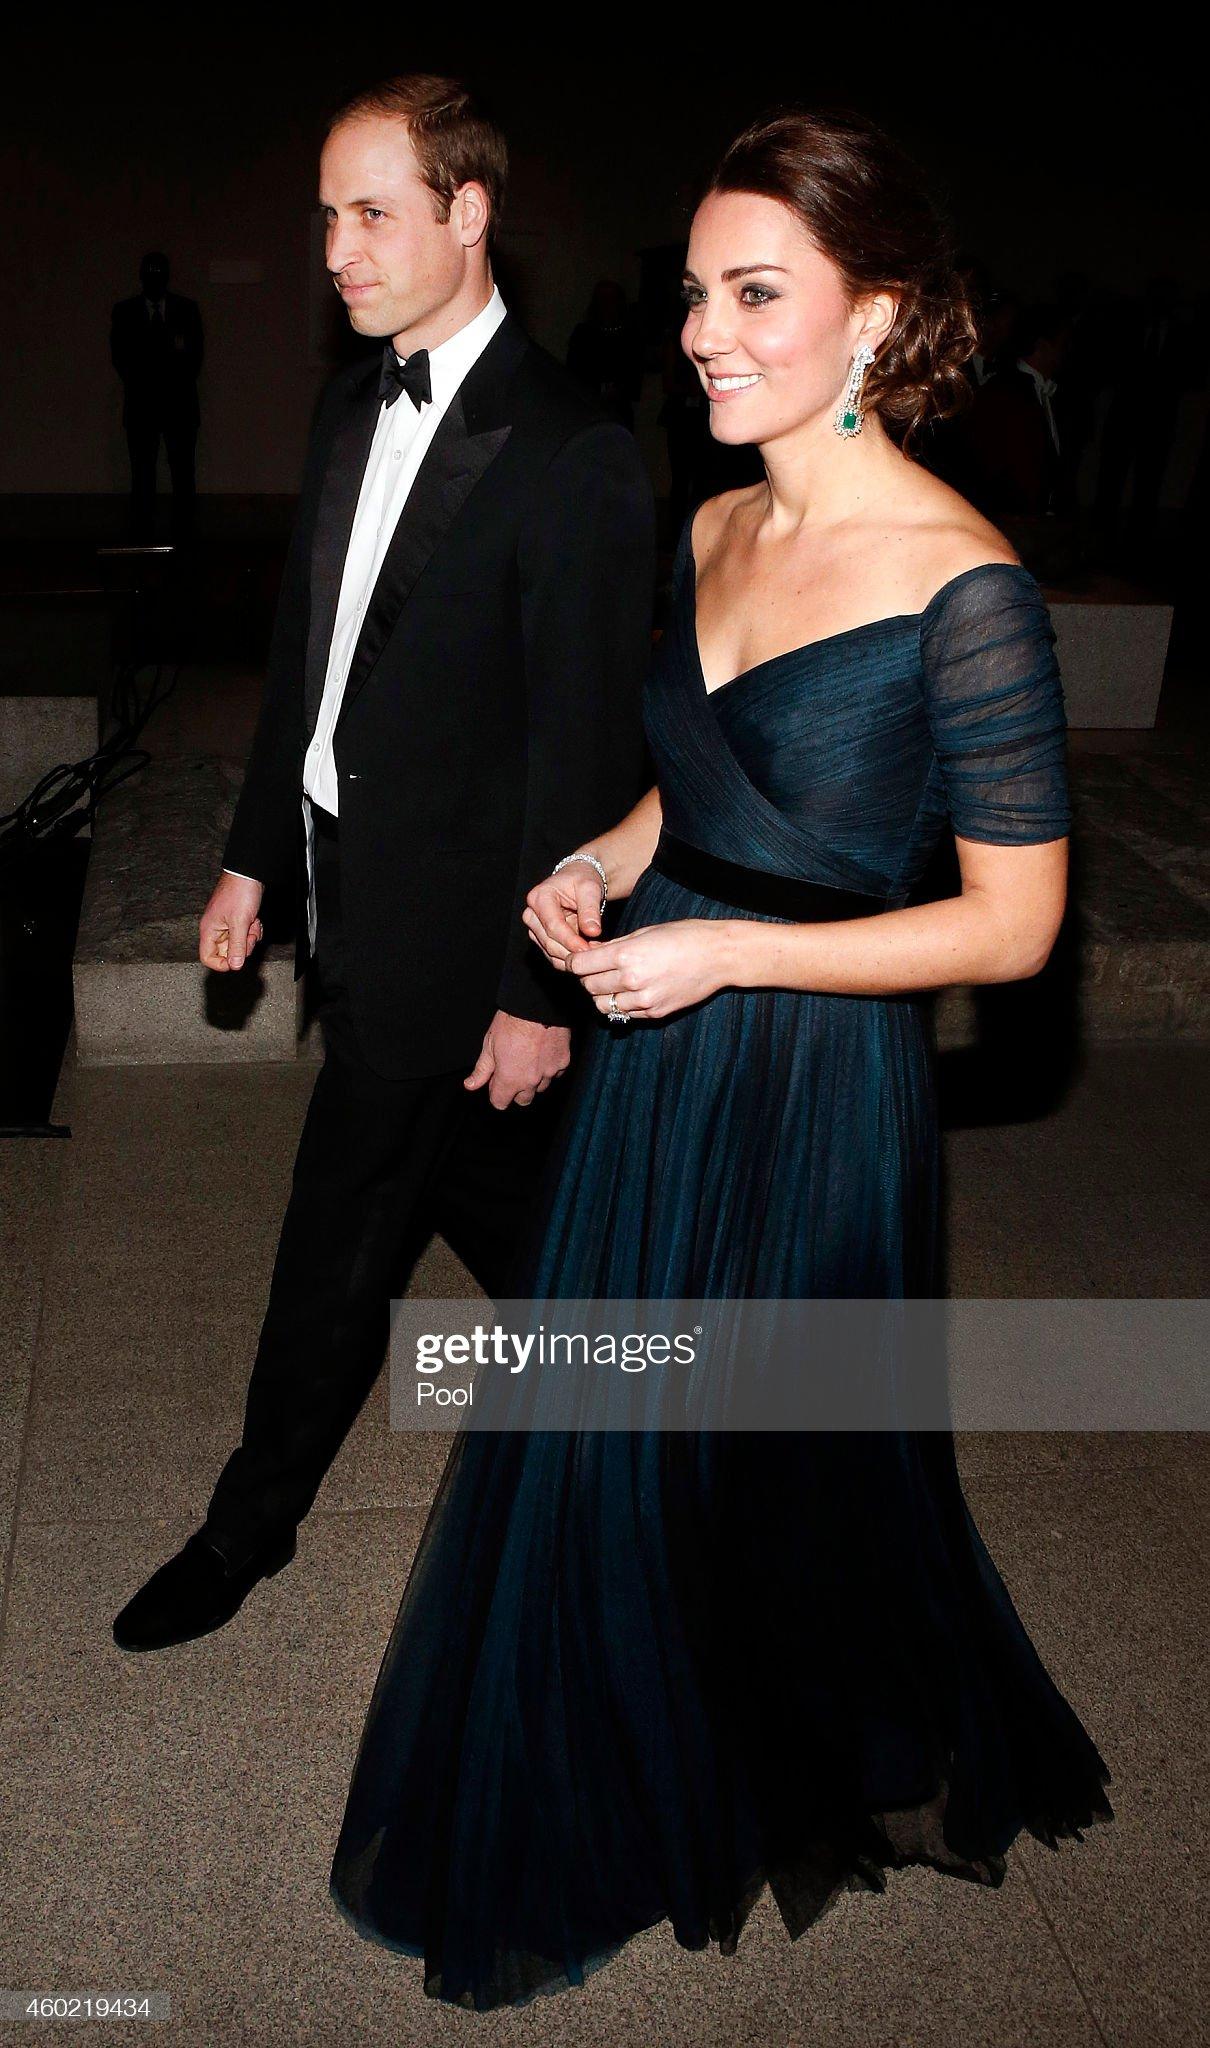 Вечерняя модница 2020 - Кэтрин, Герцогиня Кембриджская St. Andrews 600th Anniversary Dinner - Inside : News Photo